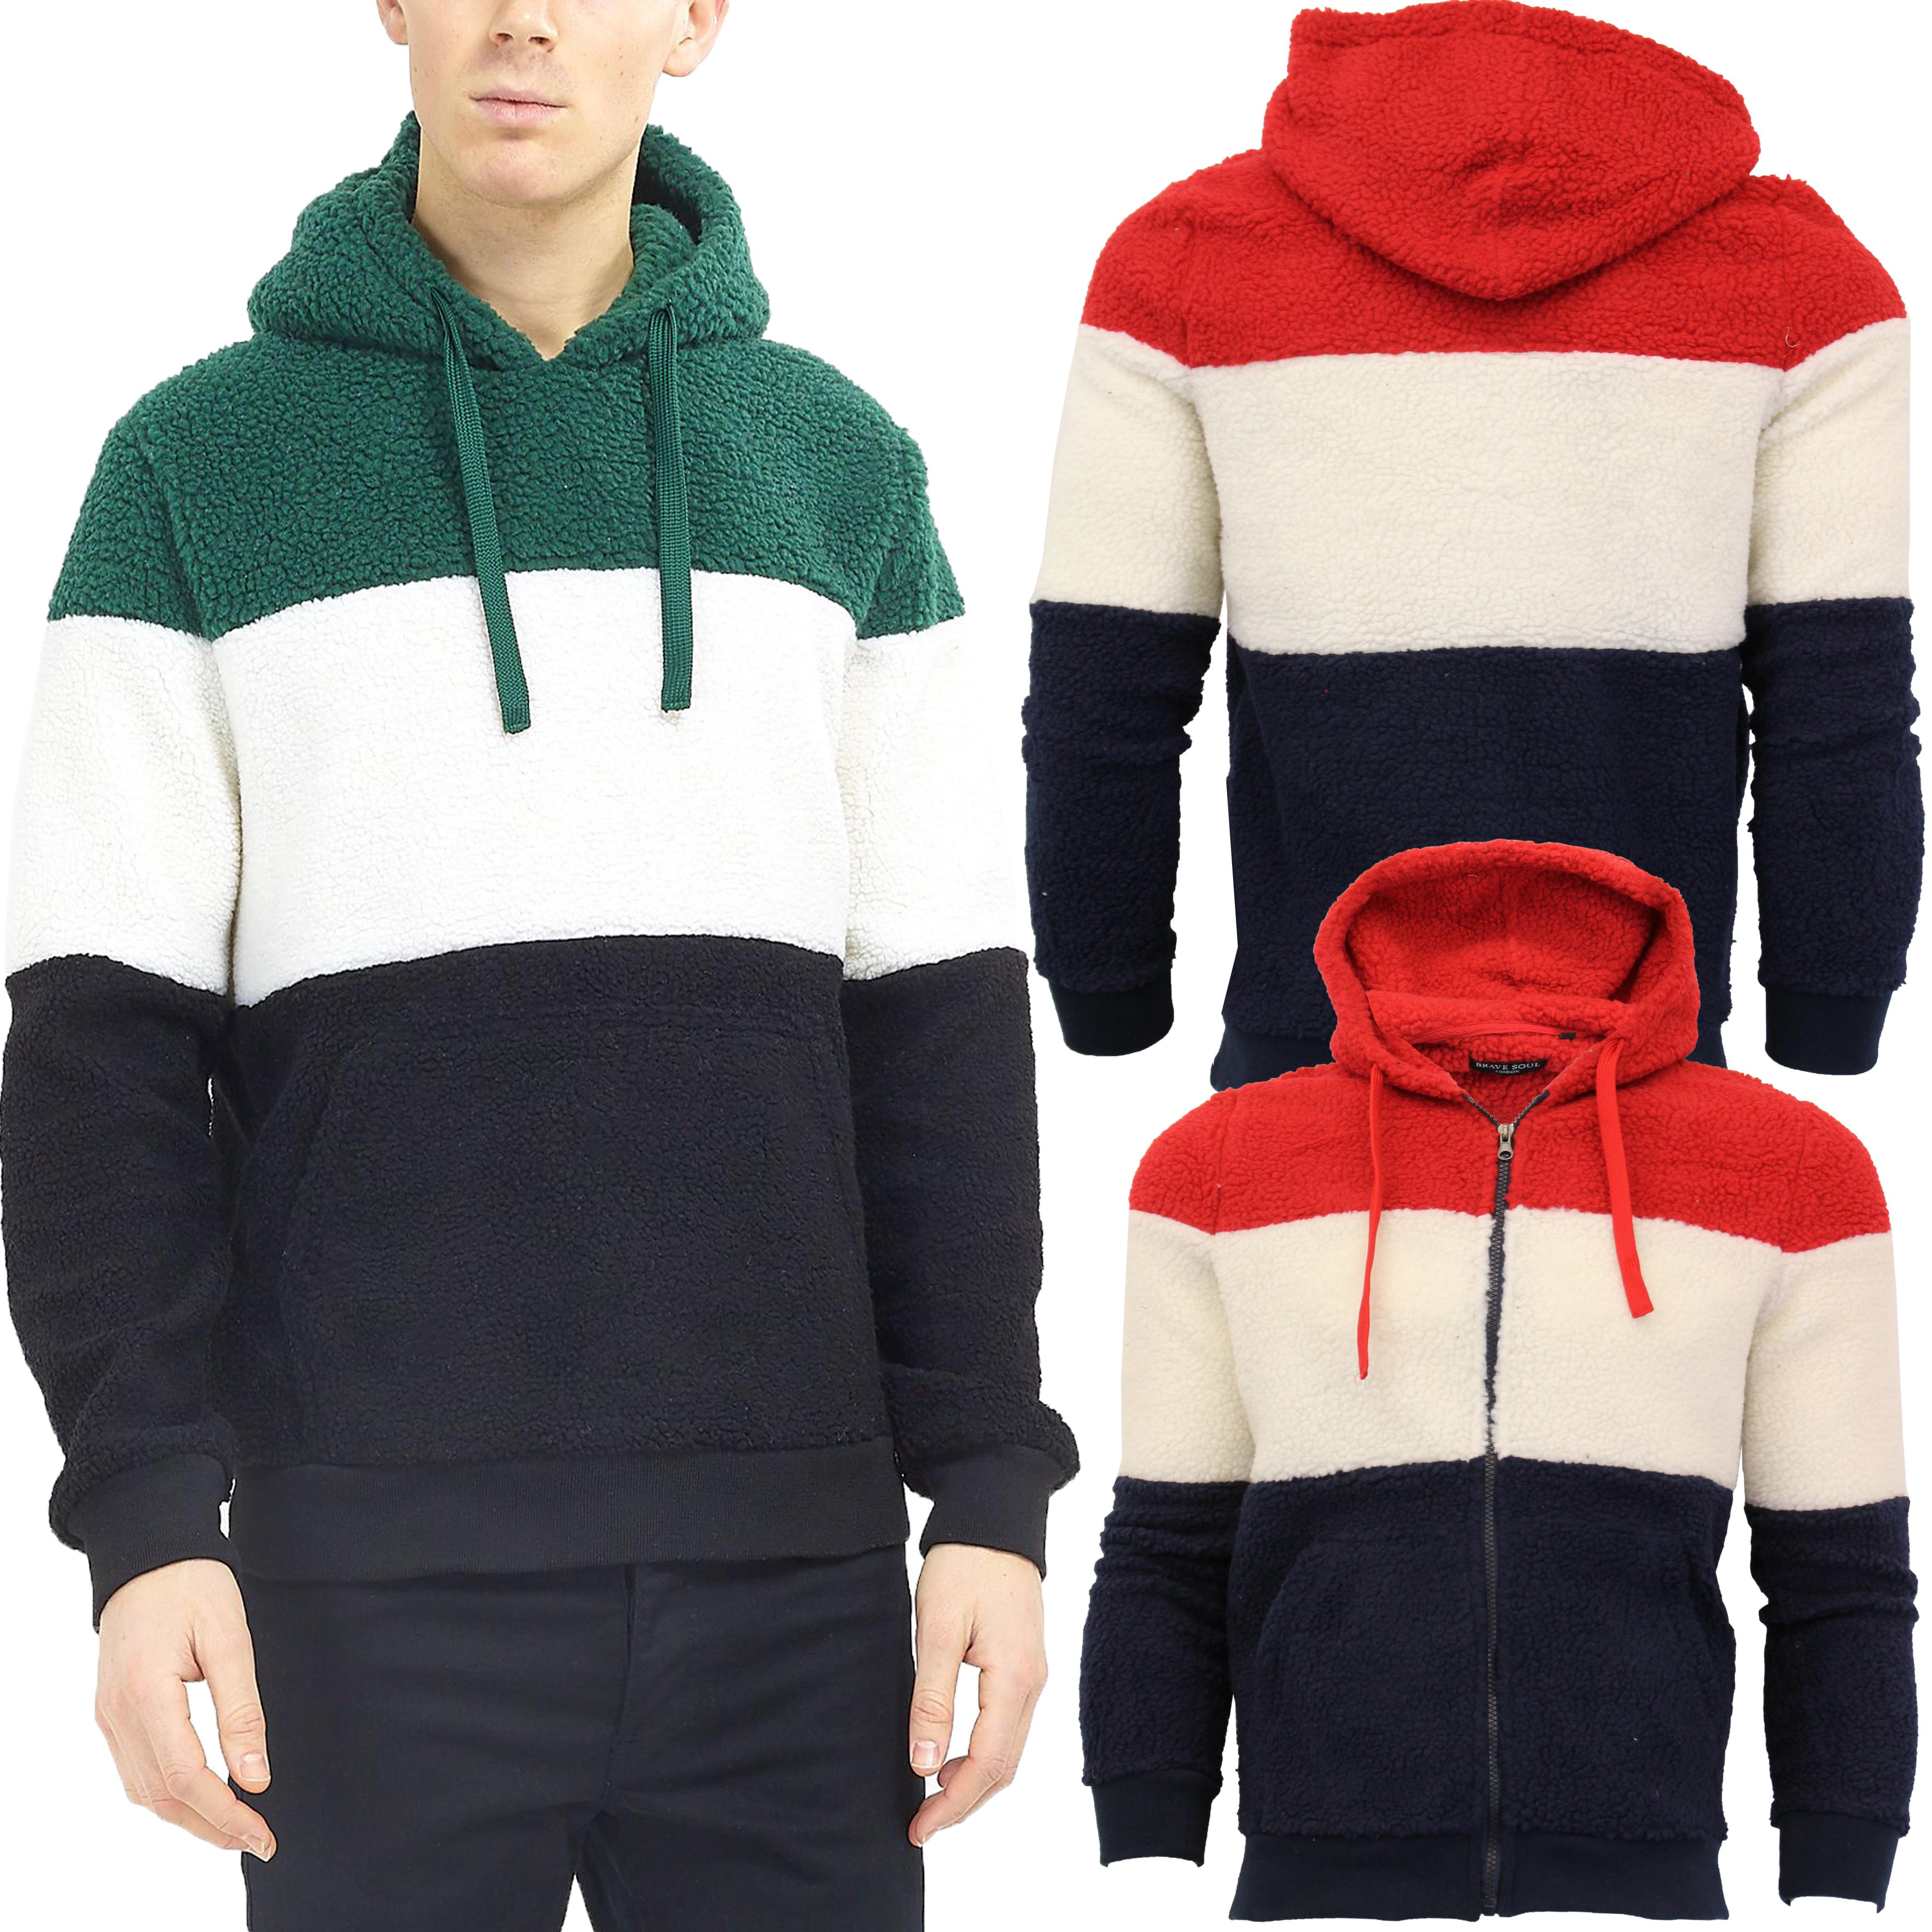 Mens-Sherpa-Fleece-Borg-Sweatshirt-Brave-Soul-Over-The-Head-Hooded-Top-Block-New thumbnail 4